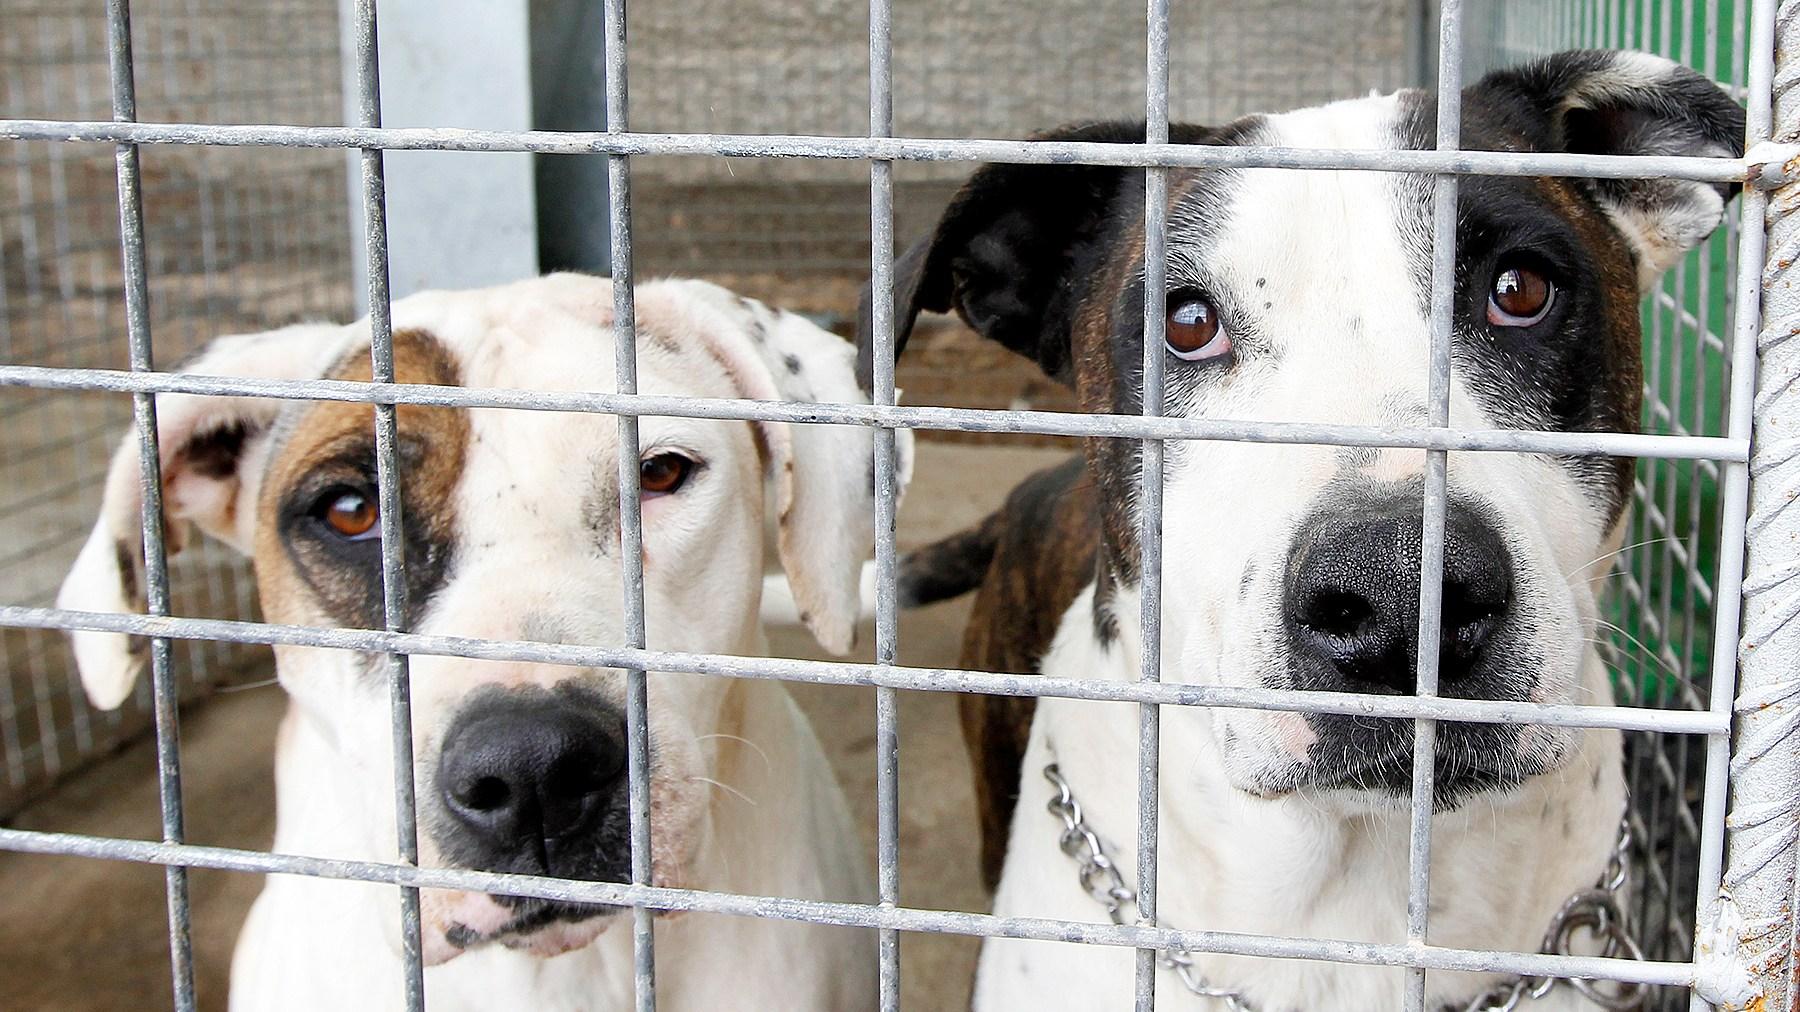 animal-shelter-af26efc3-6ad5-43ac-9e49-0dc2f72a249f